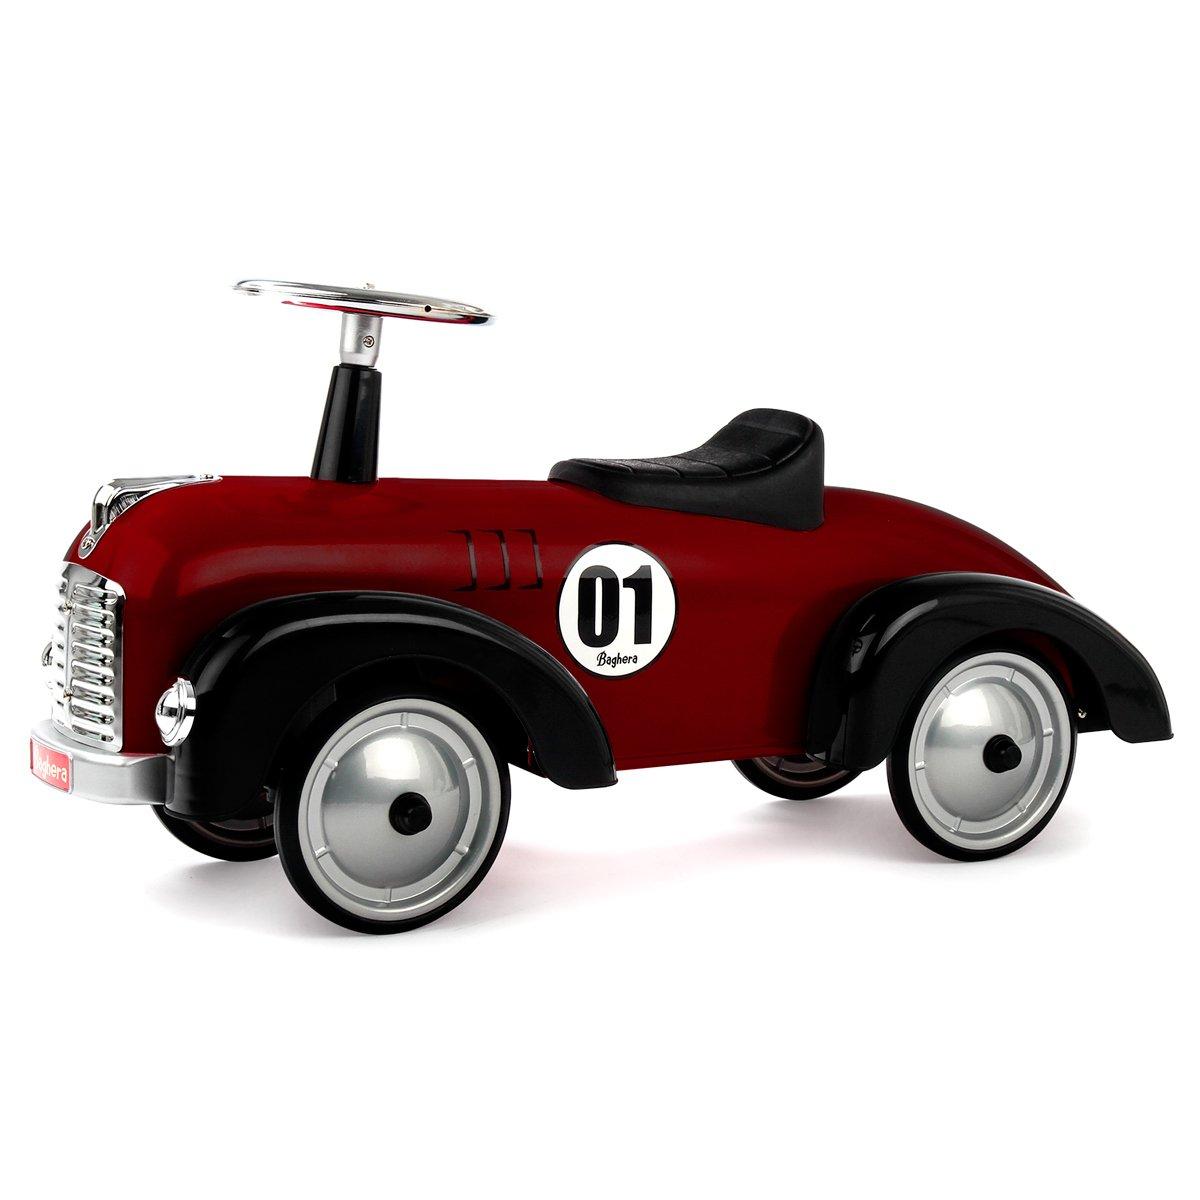 BAGHERA SPEEDSTER DARK RED RIDE ON CAR